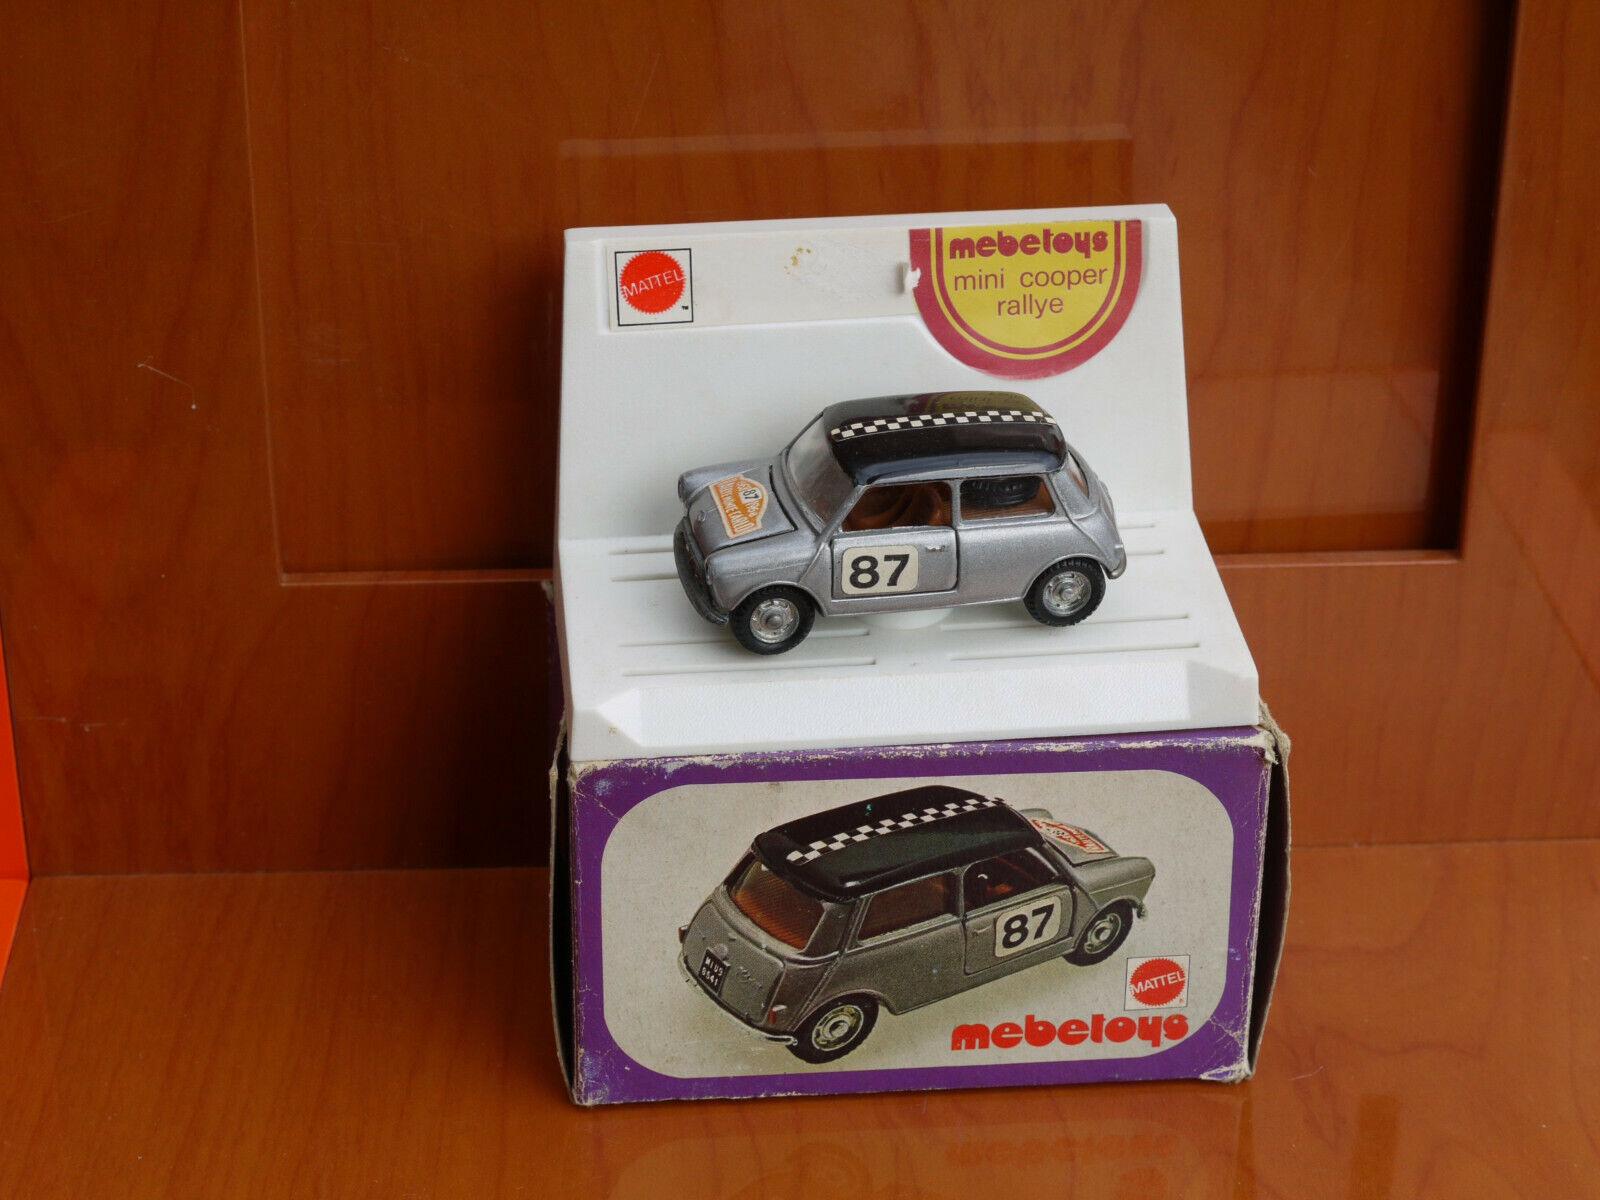 MEBETOYS A31 Mini Cooper Rallye 1 43 MB con scatola